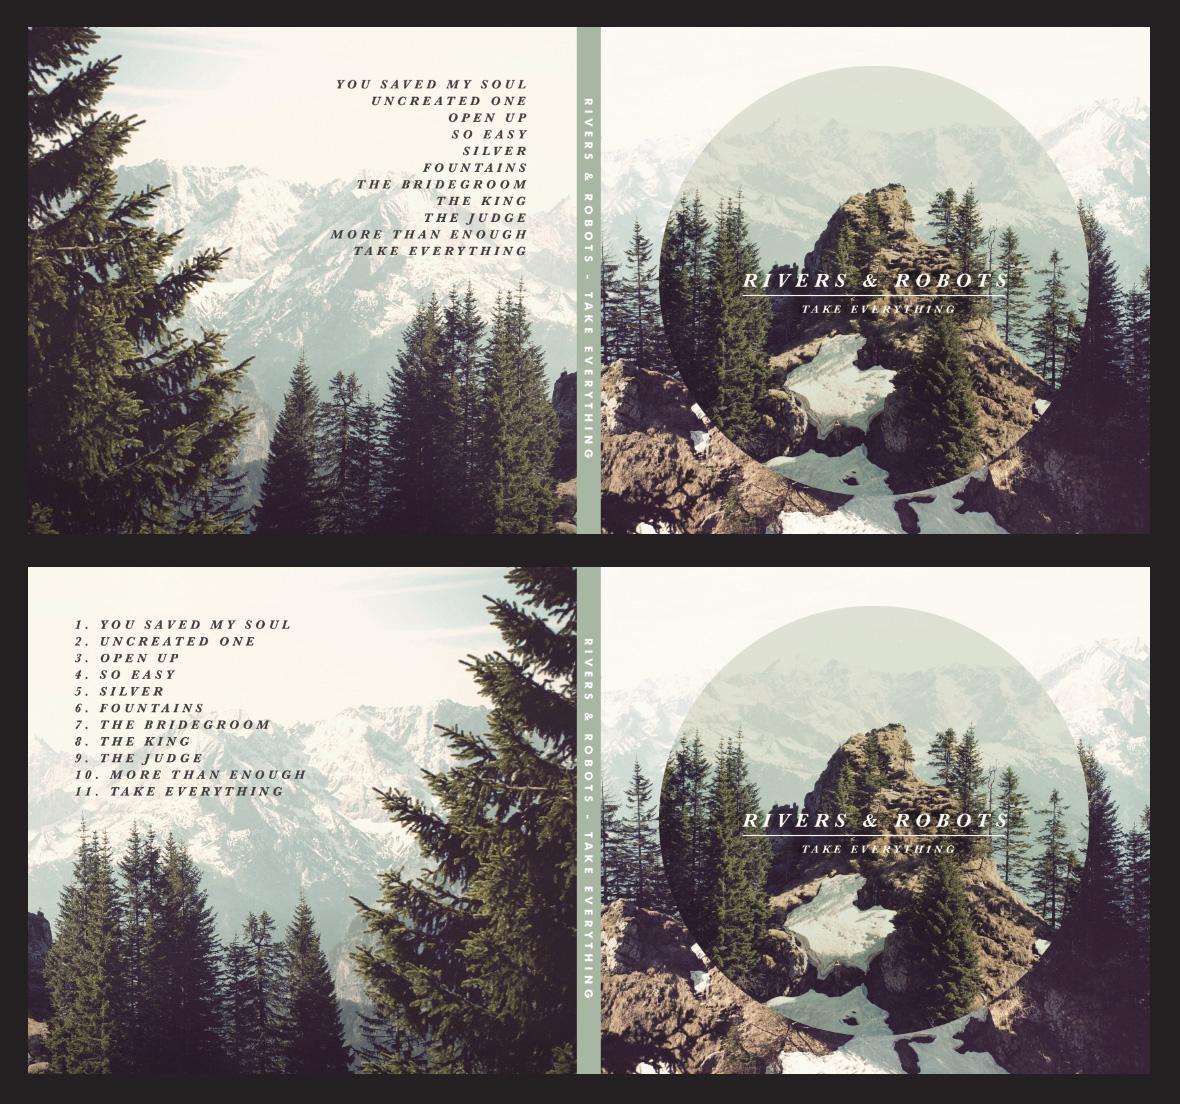 Albumart